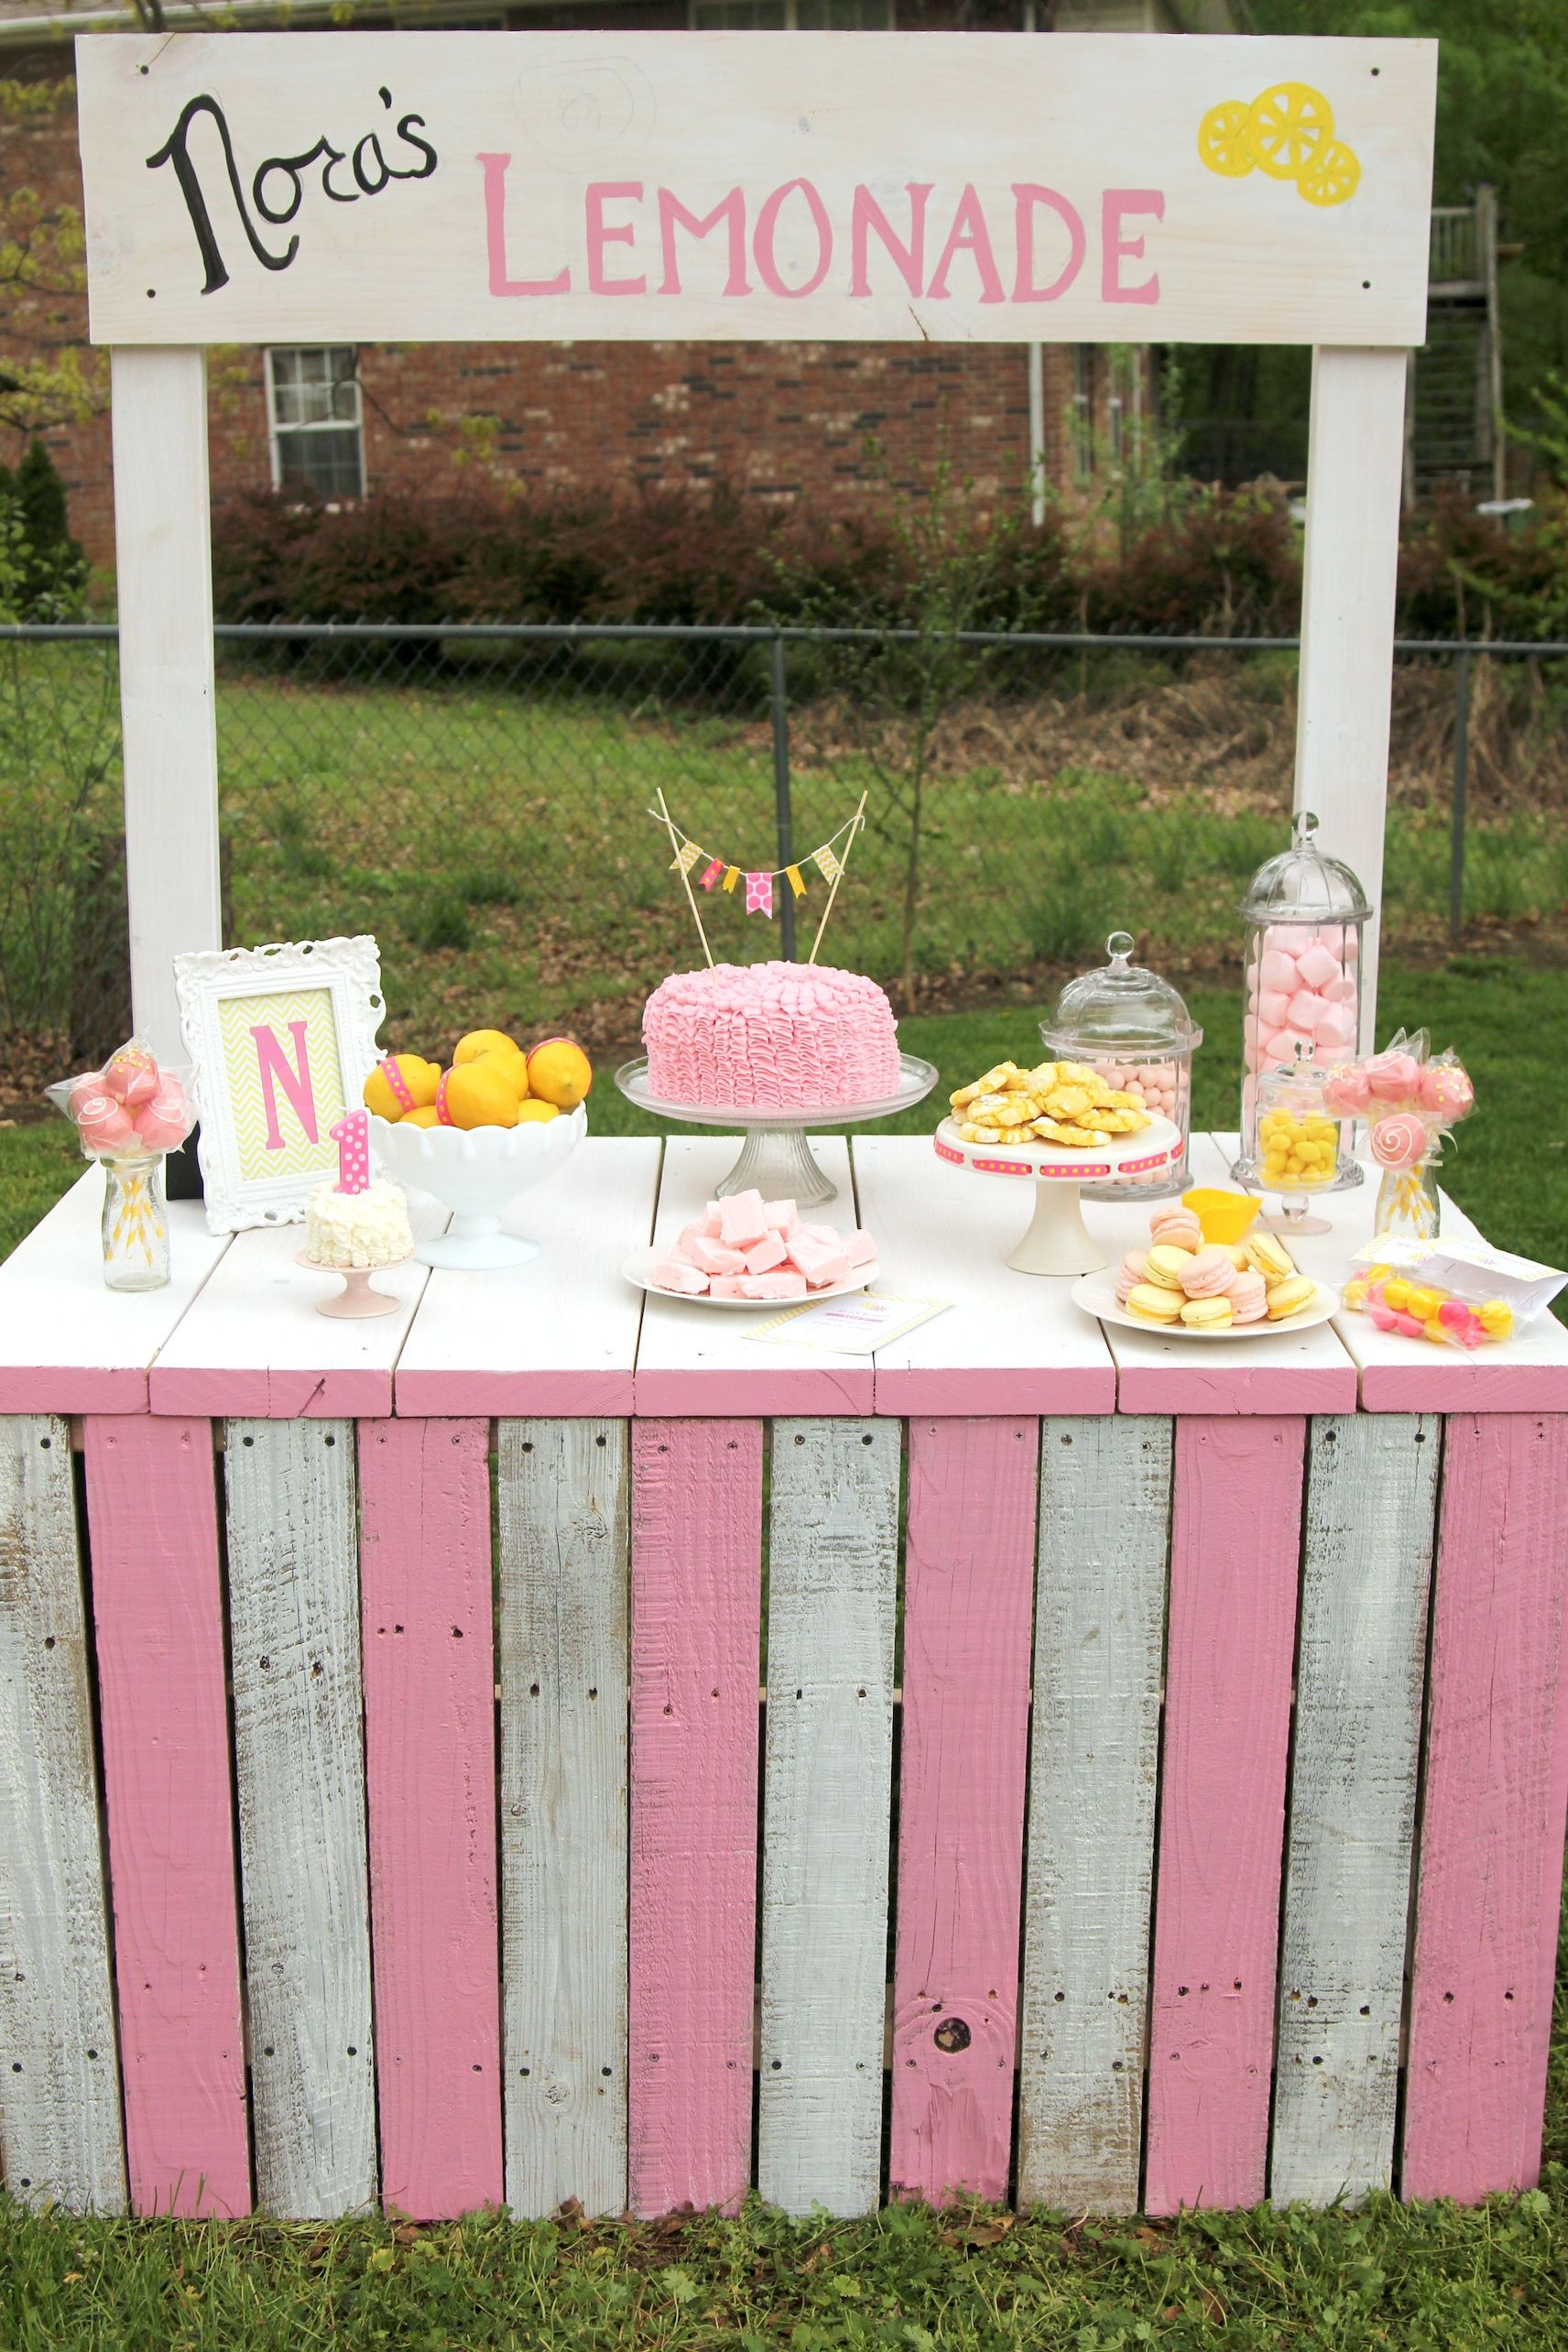 Sunshine & Lemonade Party sweets, Lemonade and Sunshine